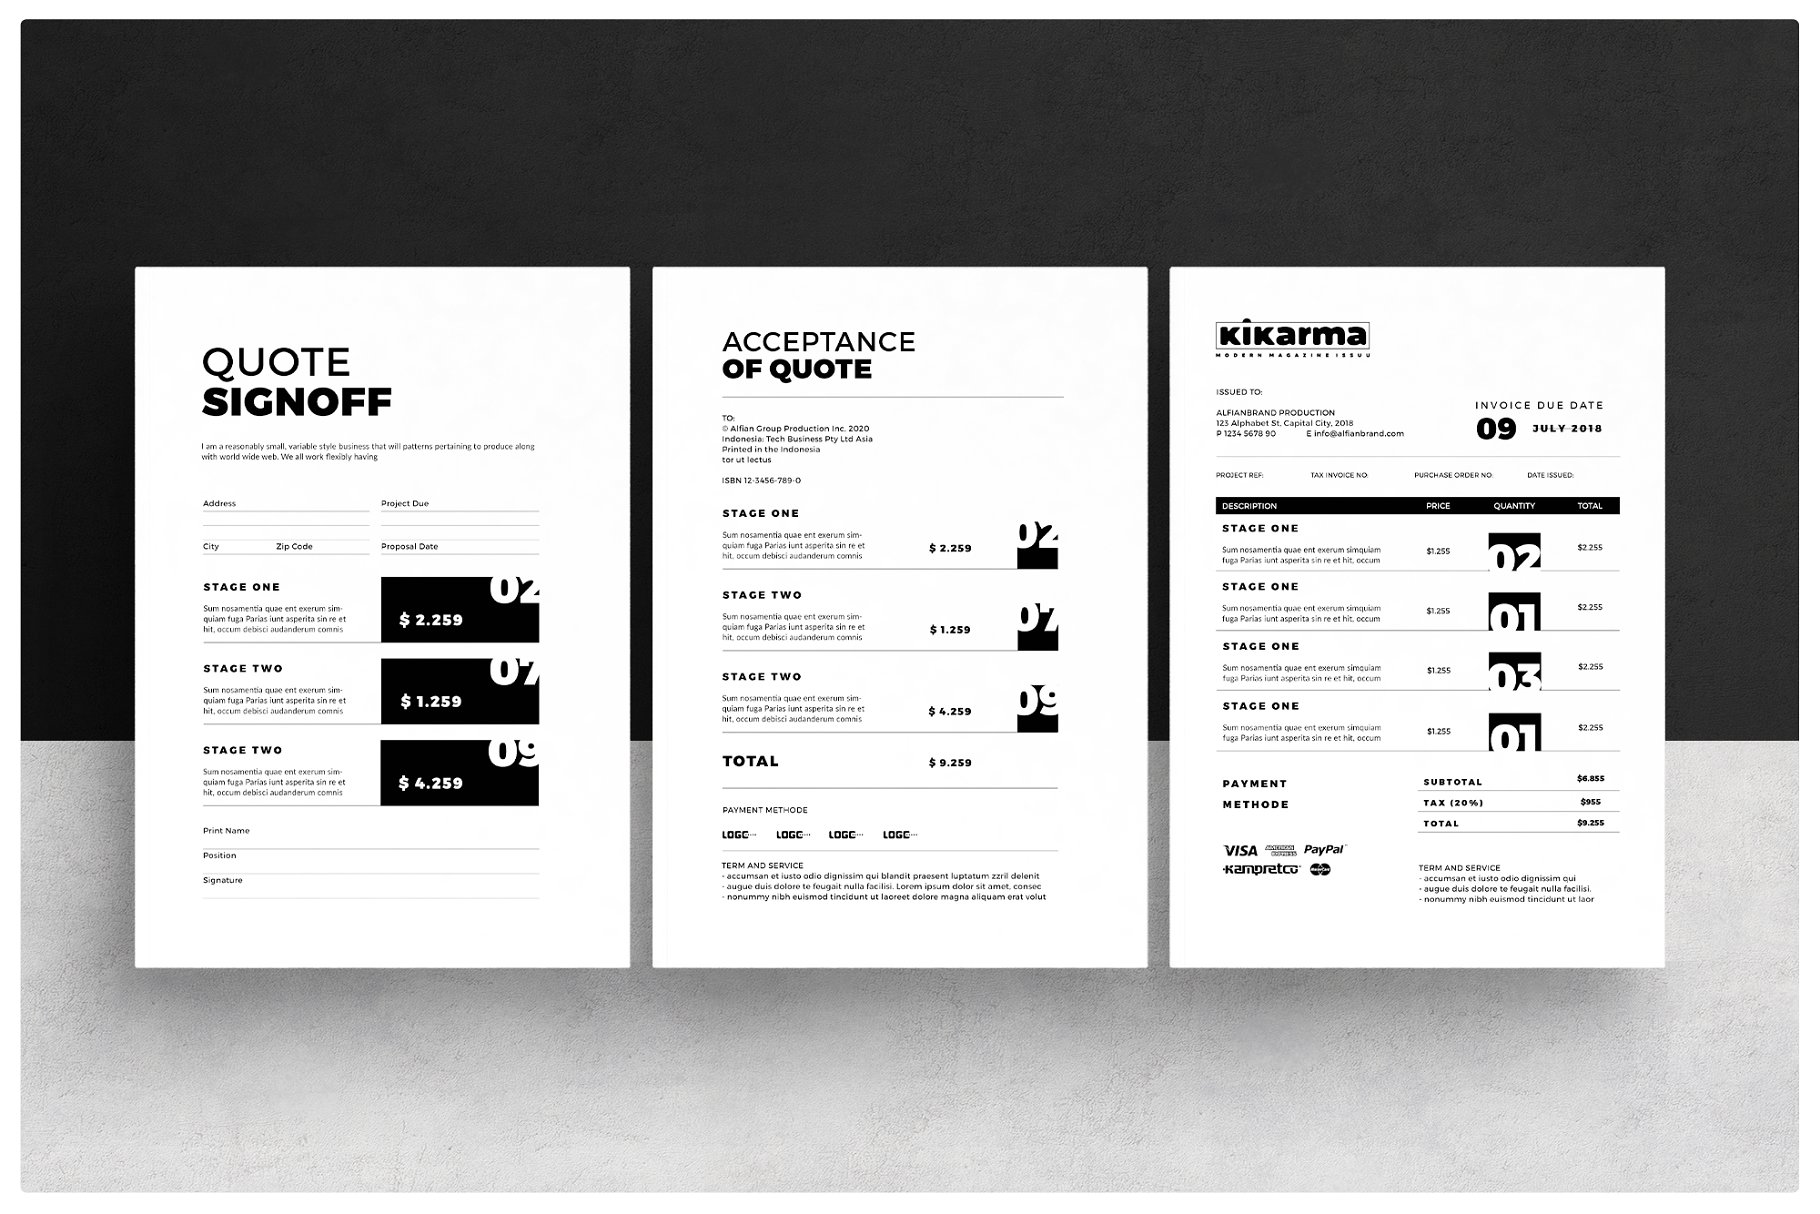 business-proposal-.jpg